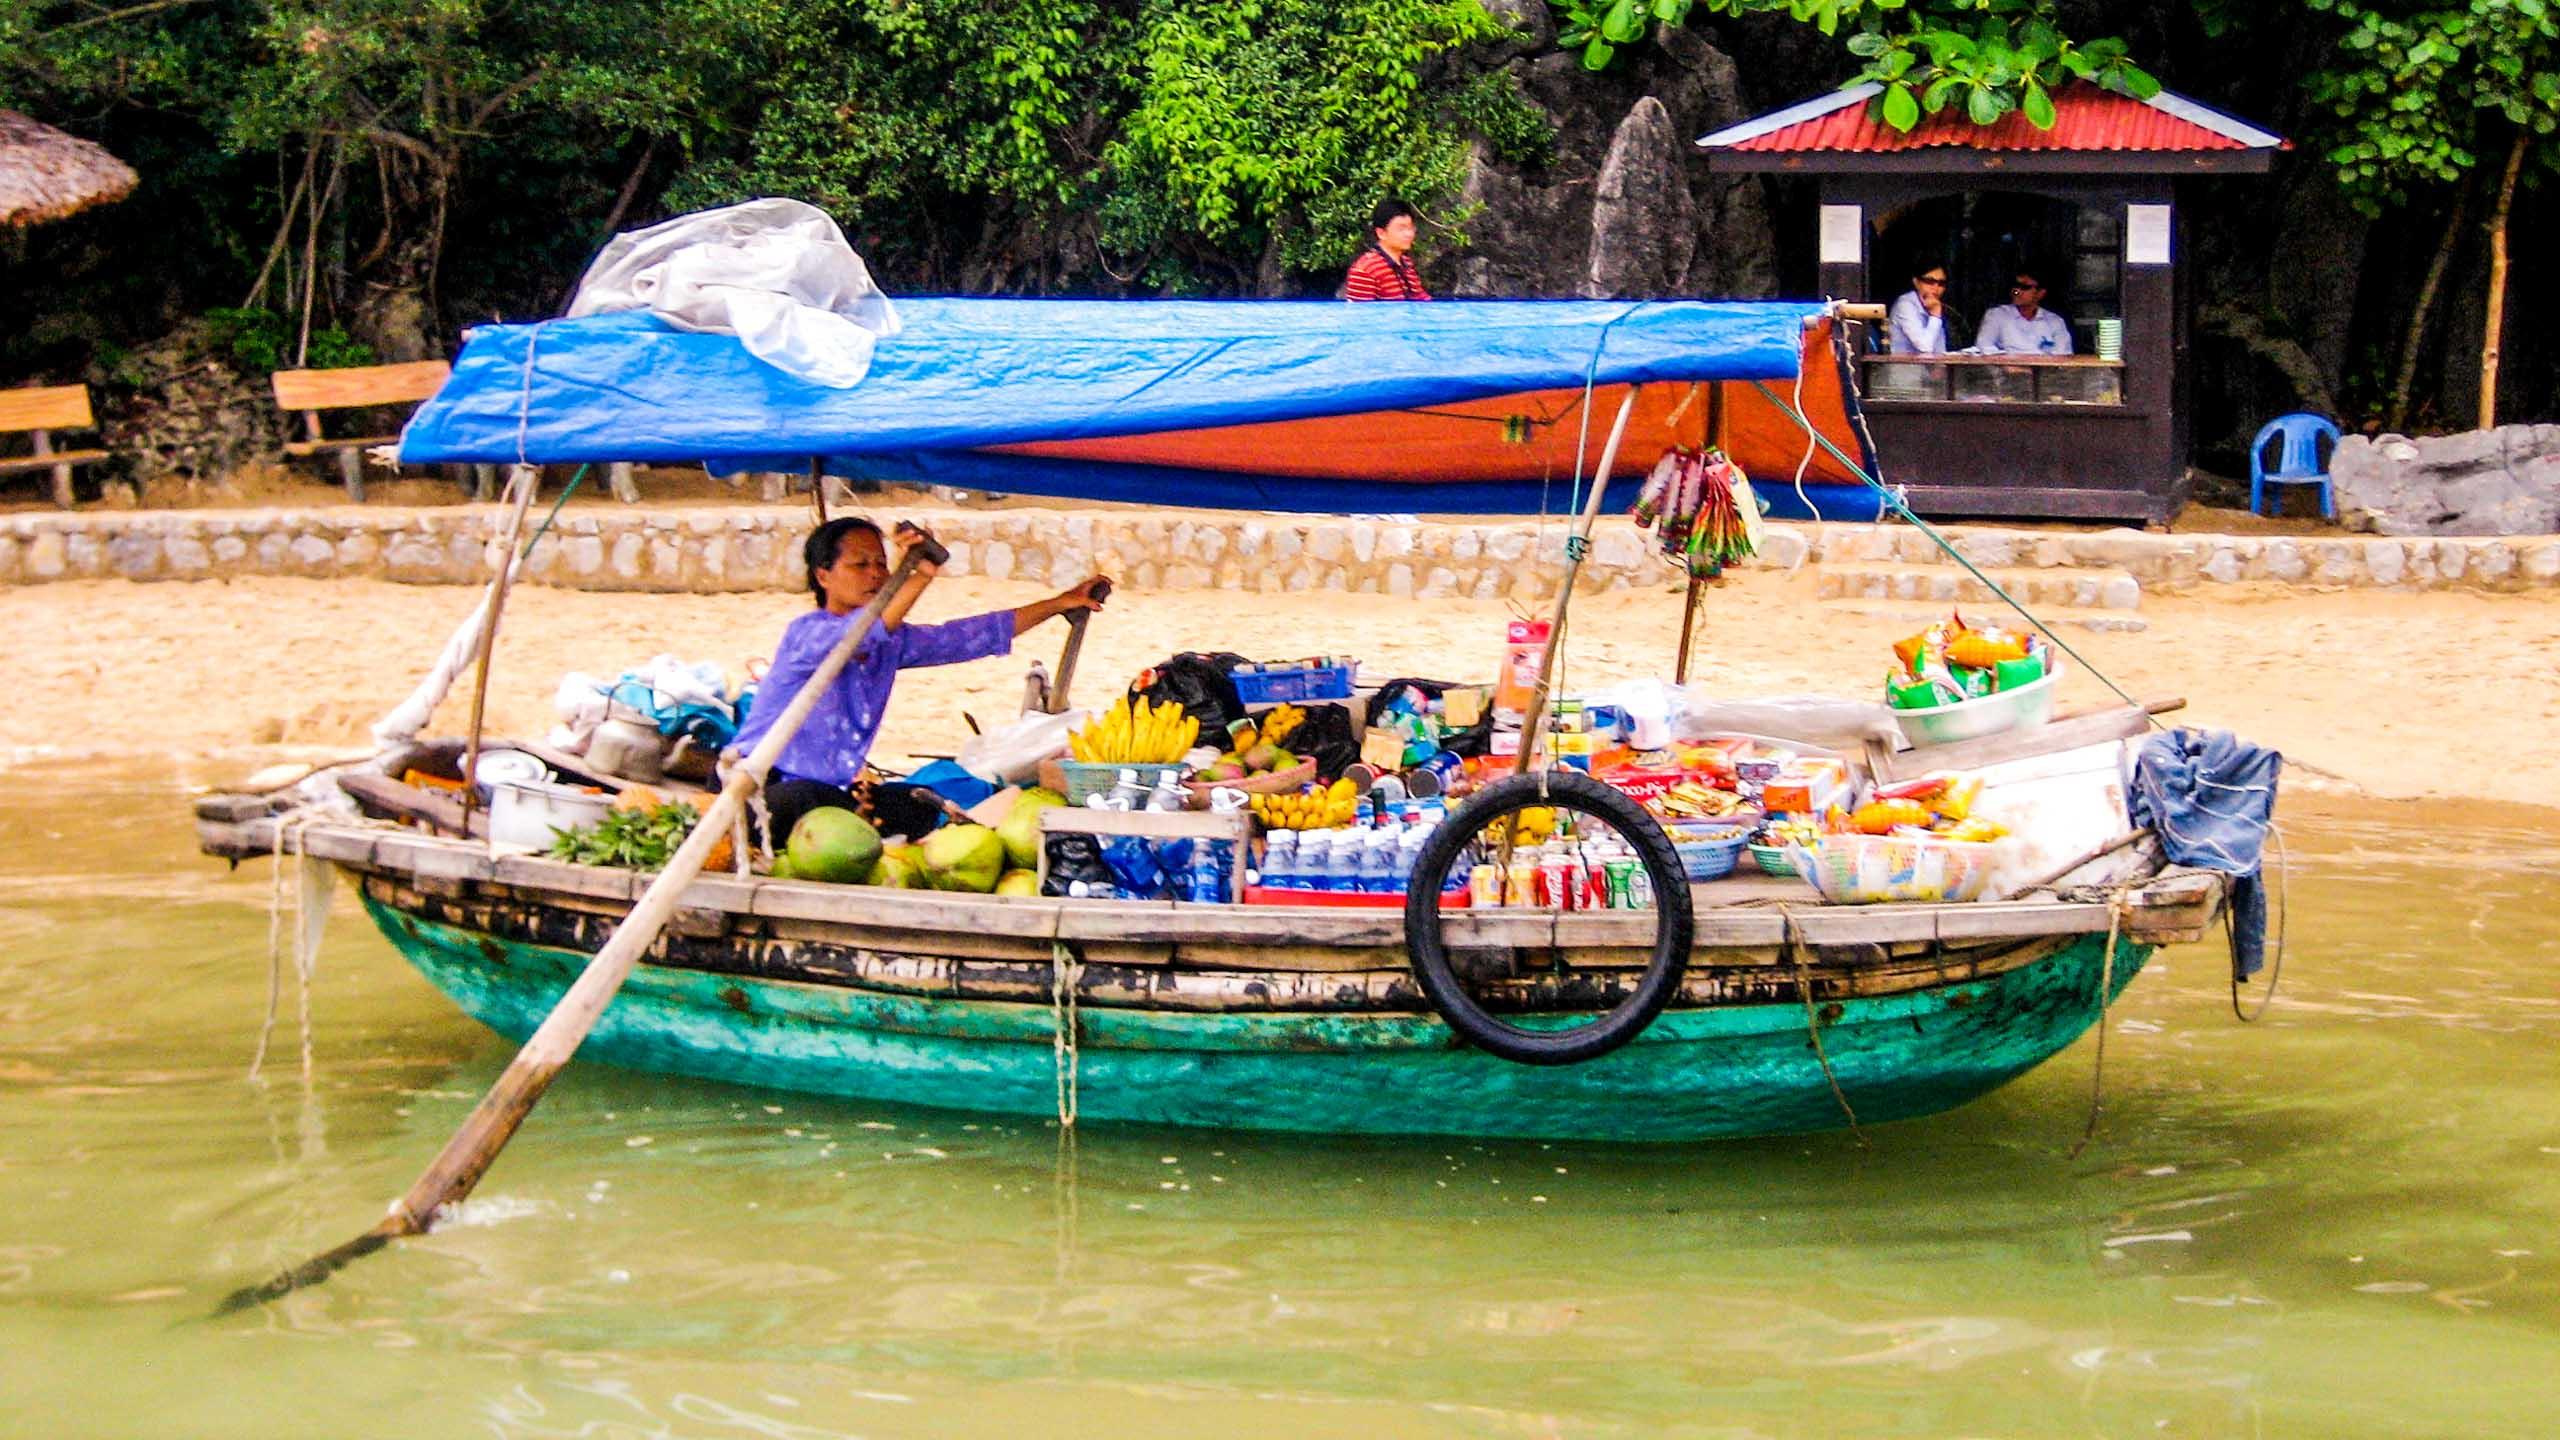 Woman rows boat full of goods in Vietnam